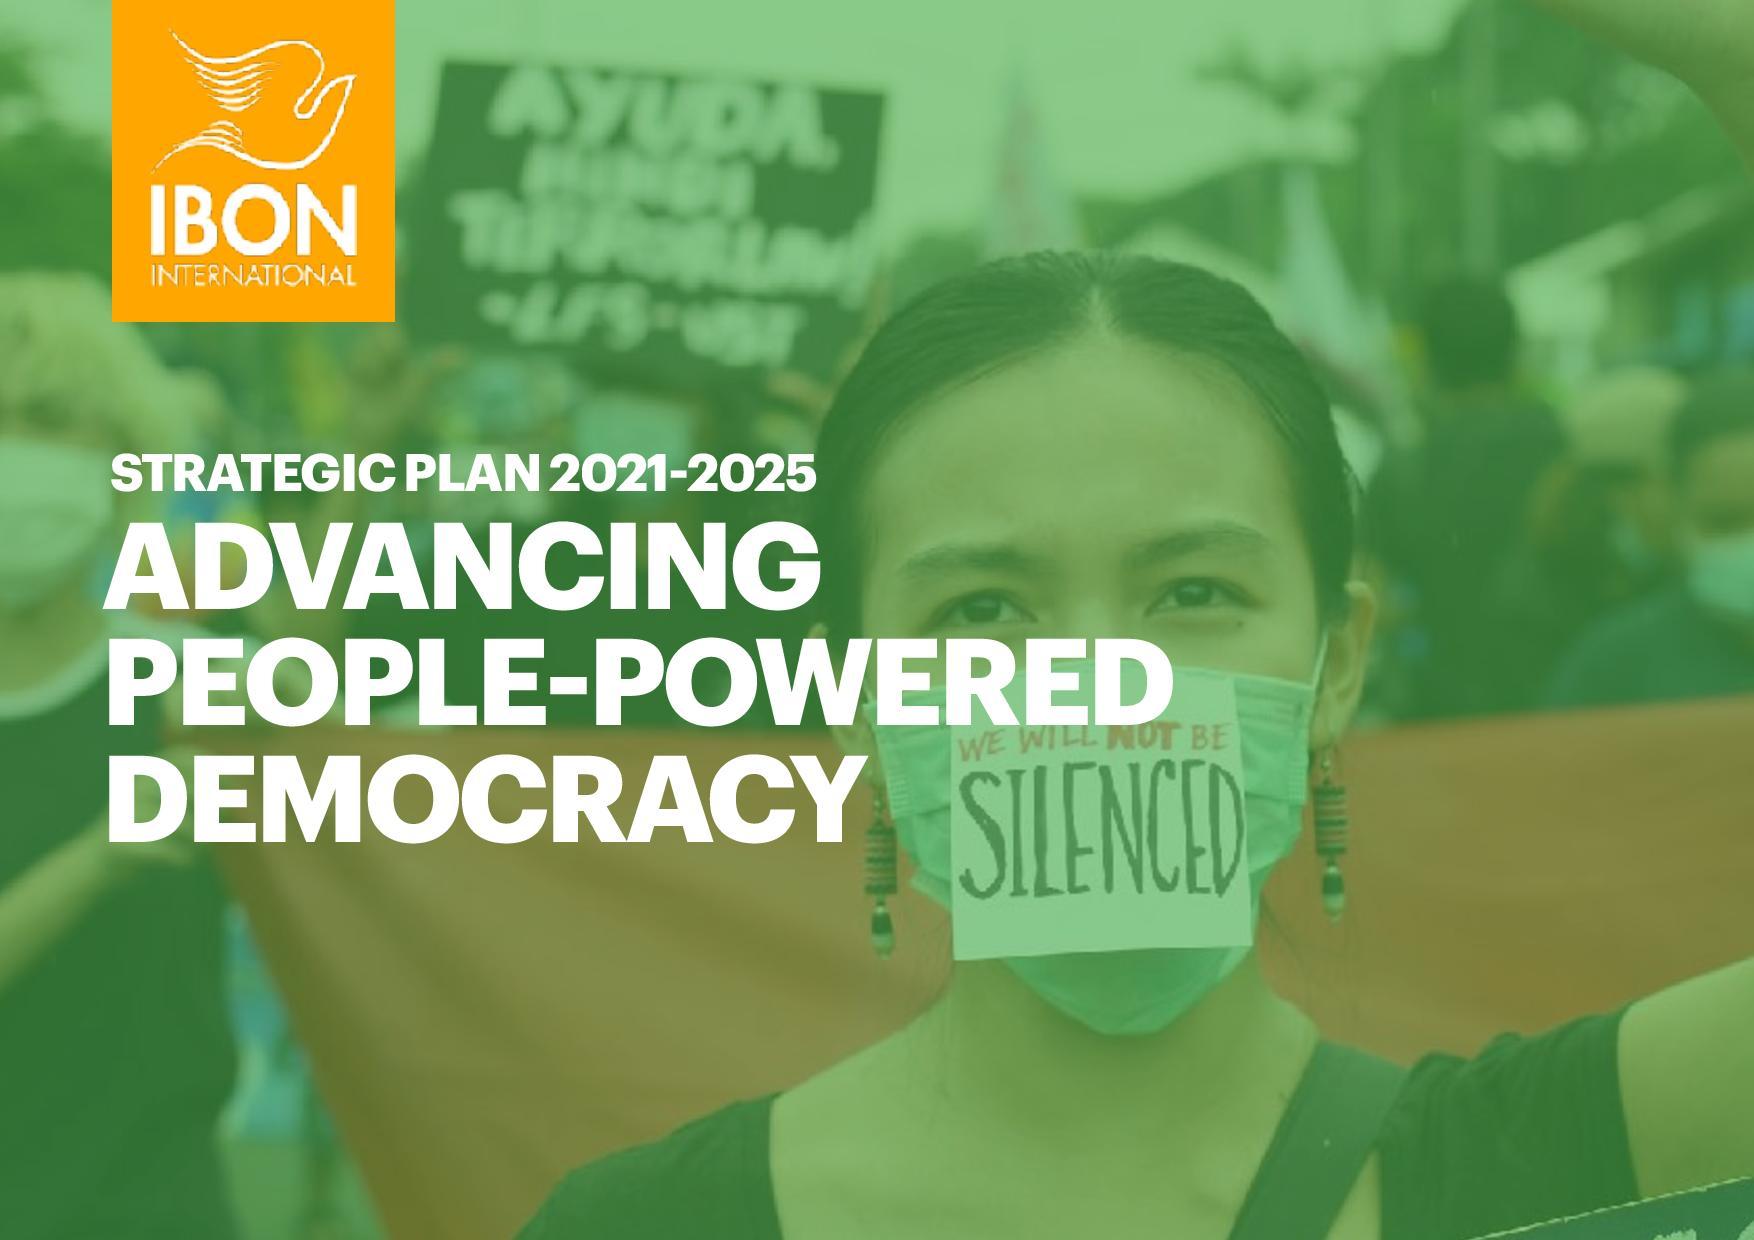 "Strategic Plan 2021 - 2025 <span class=""pt_splitter pt_splitter-1"">Advancing People-Powered Democracy</span>"